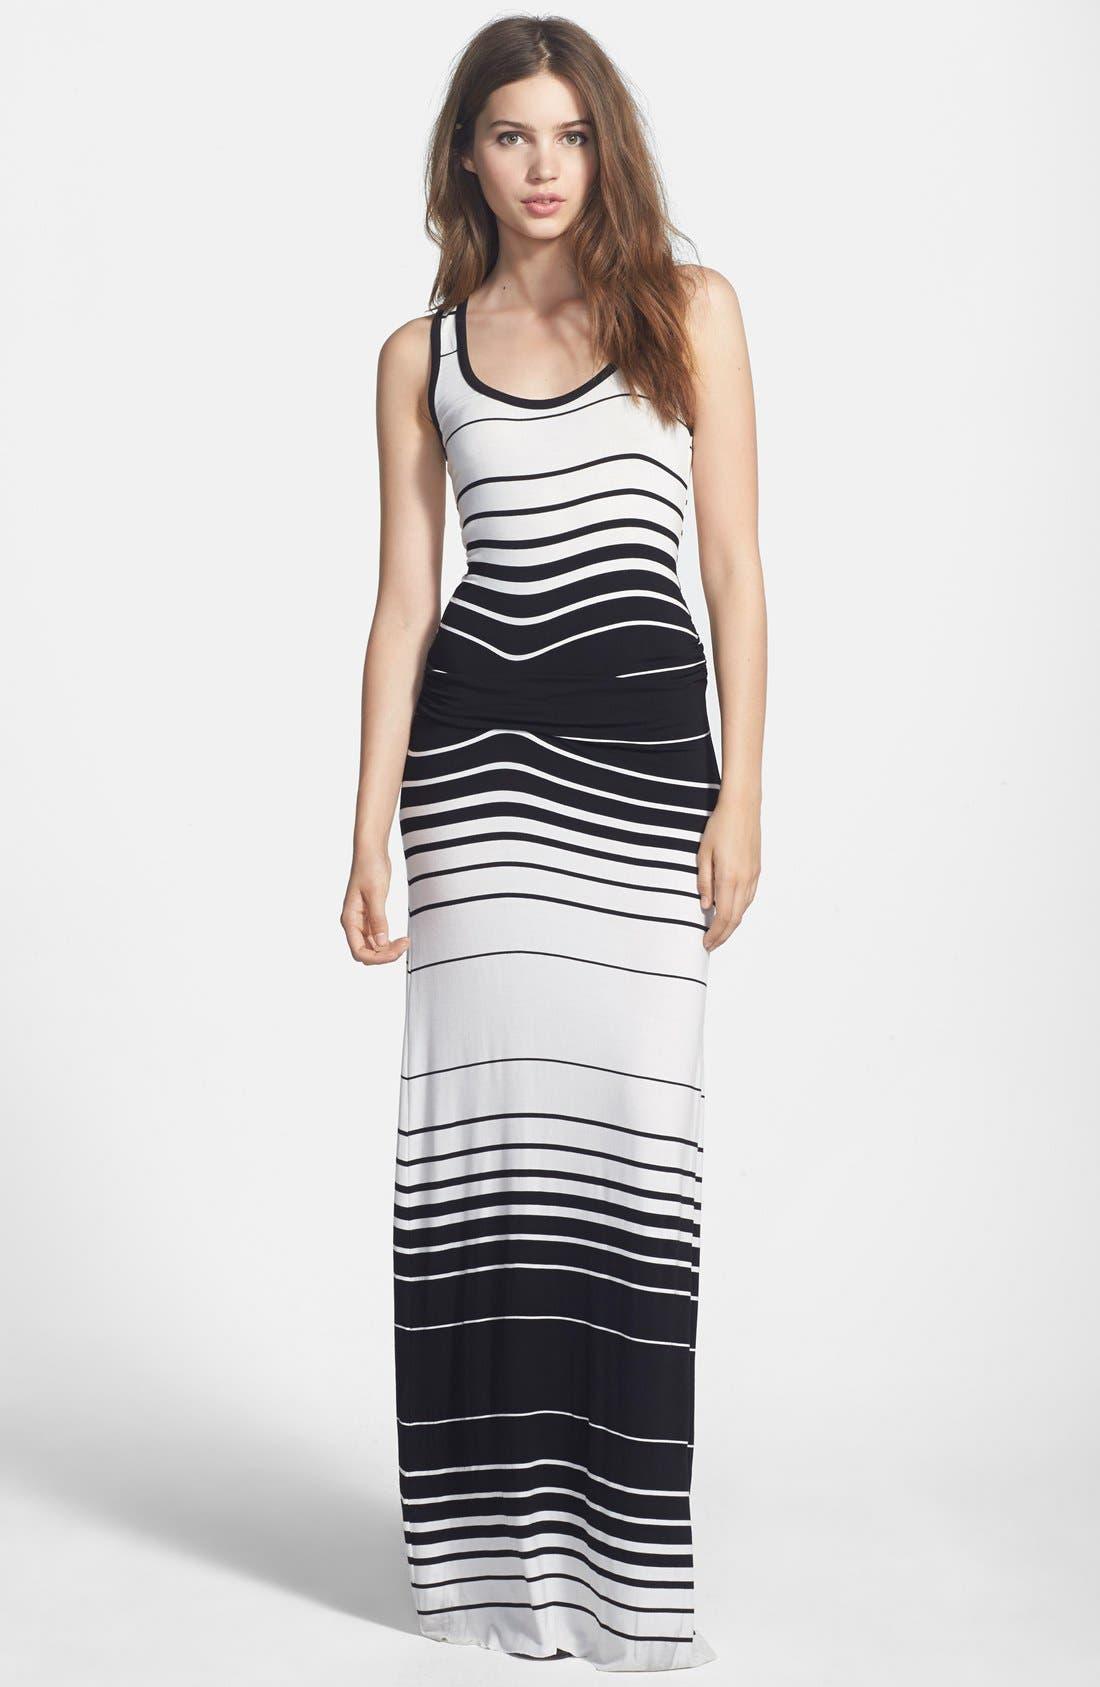 Main Image - Young, Fabulous & Broke 'Hamptons' Stripe Maxi Dress